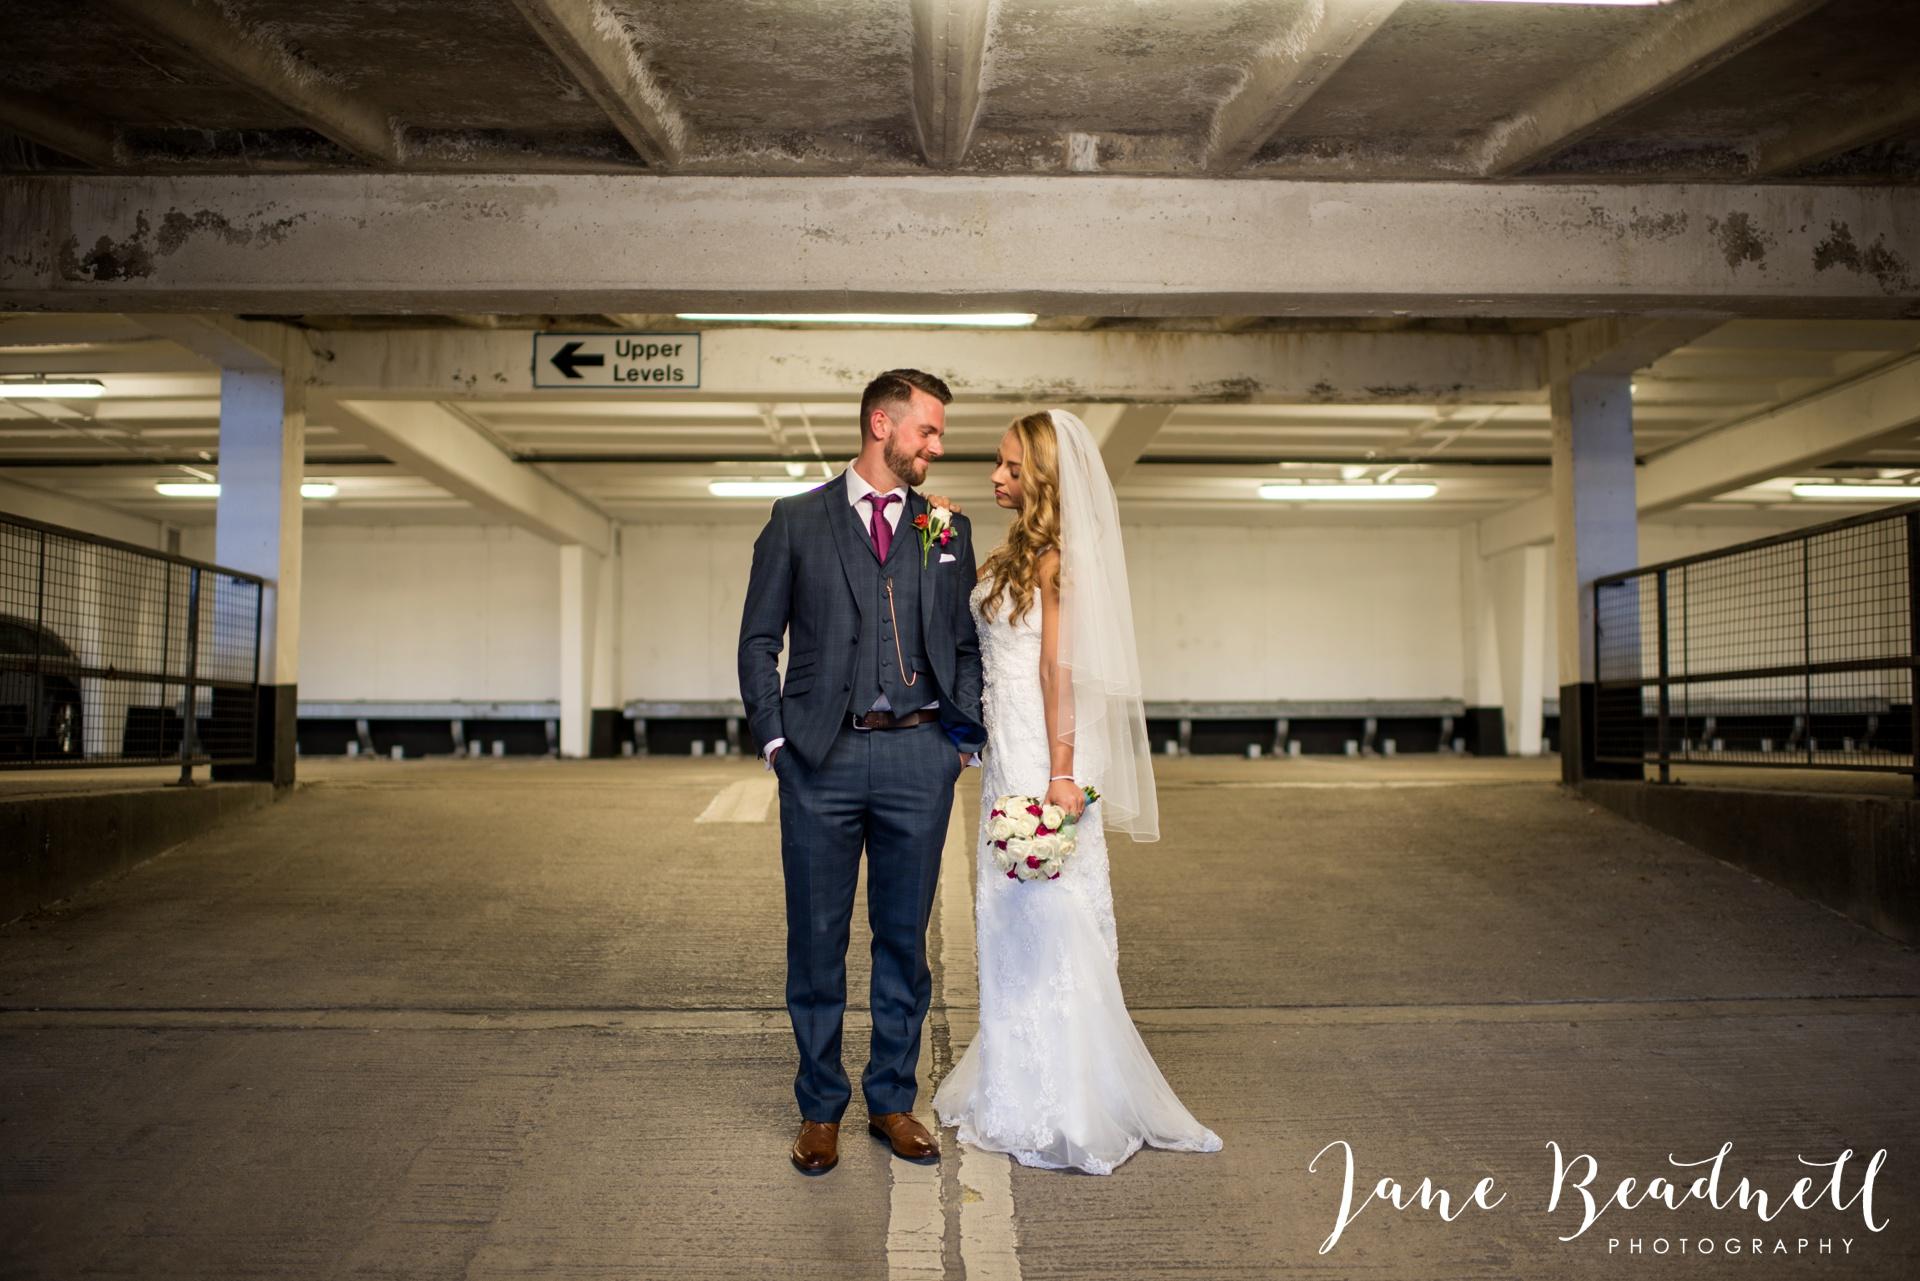 Jane Beadnell fine art wedding photographer Harrogate_0006